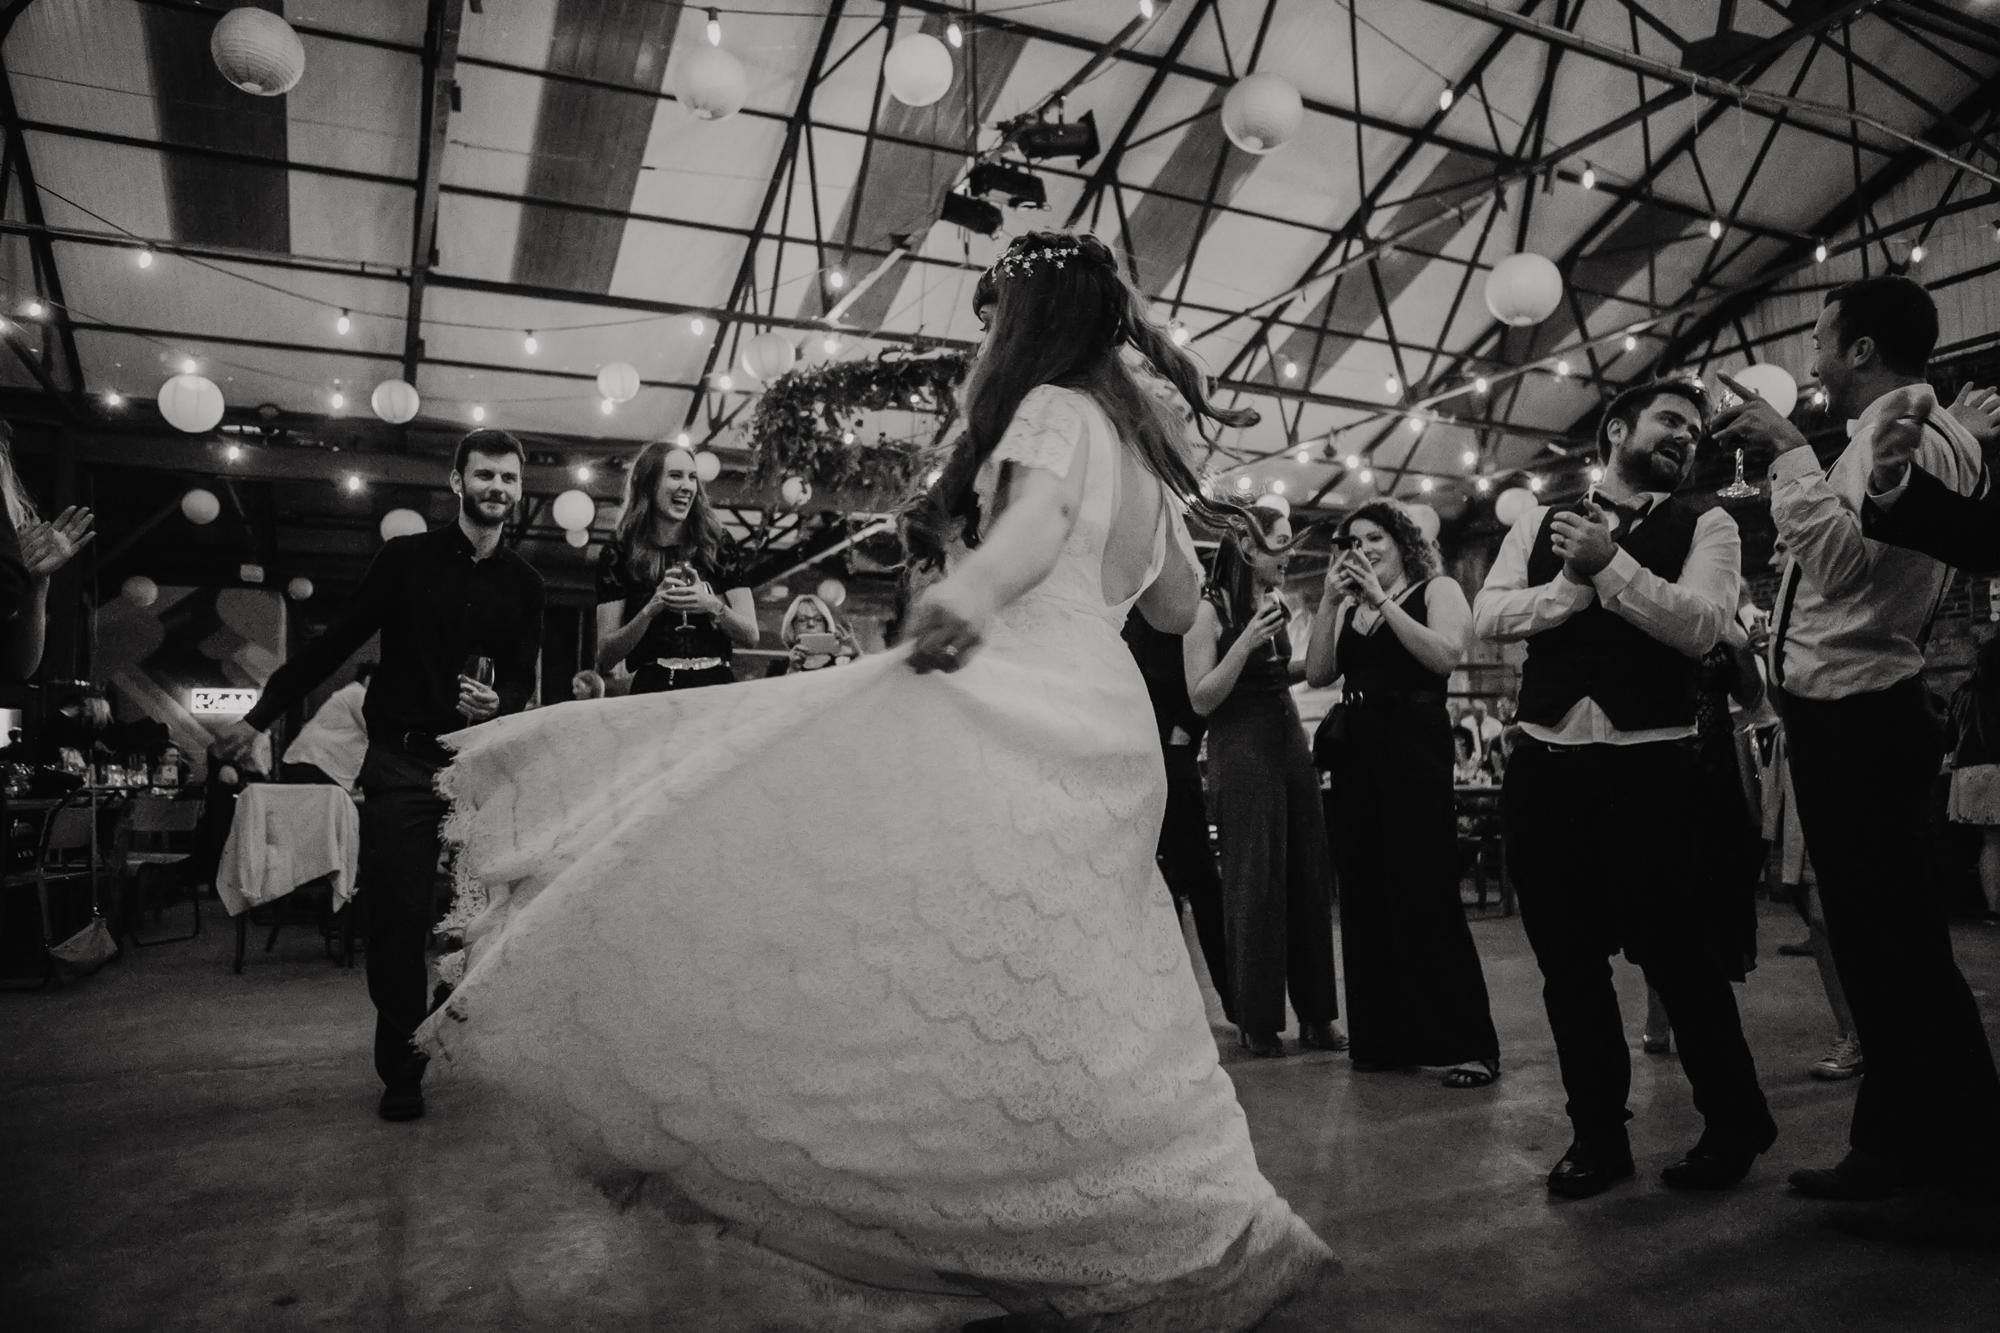 Kristy-Back-Garden-Outdoor-Wedding-Sheffield-Industrial-Warehouse-Wedding-Bohemian-Kate-Beaumont-Dahlia-Dress-57.jpg